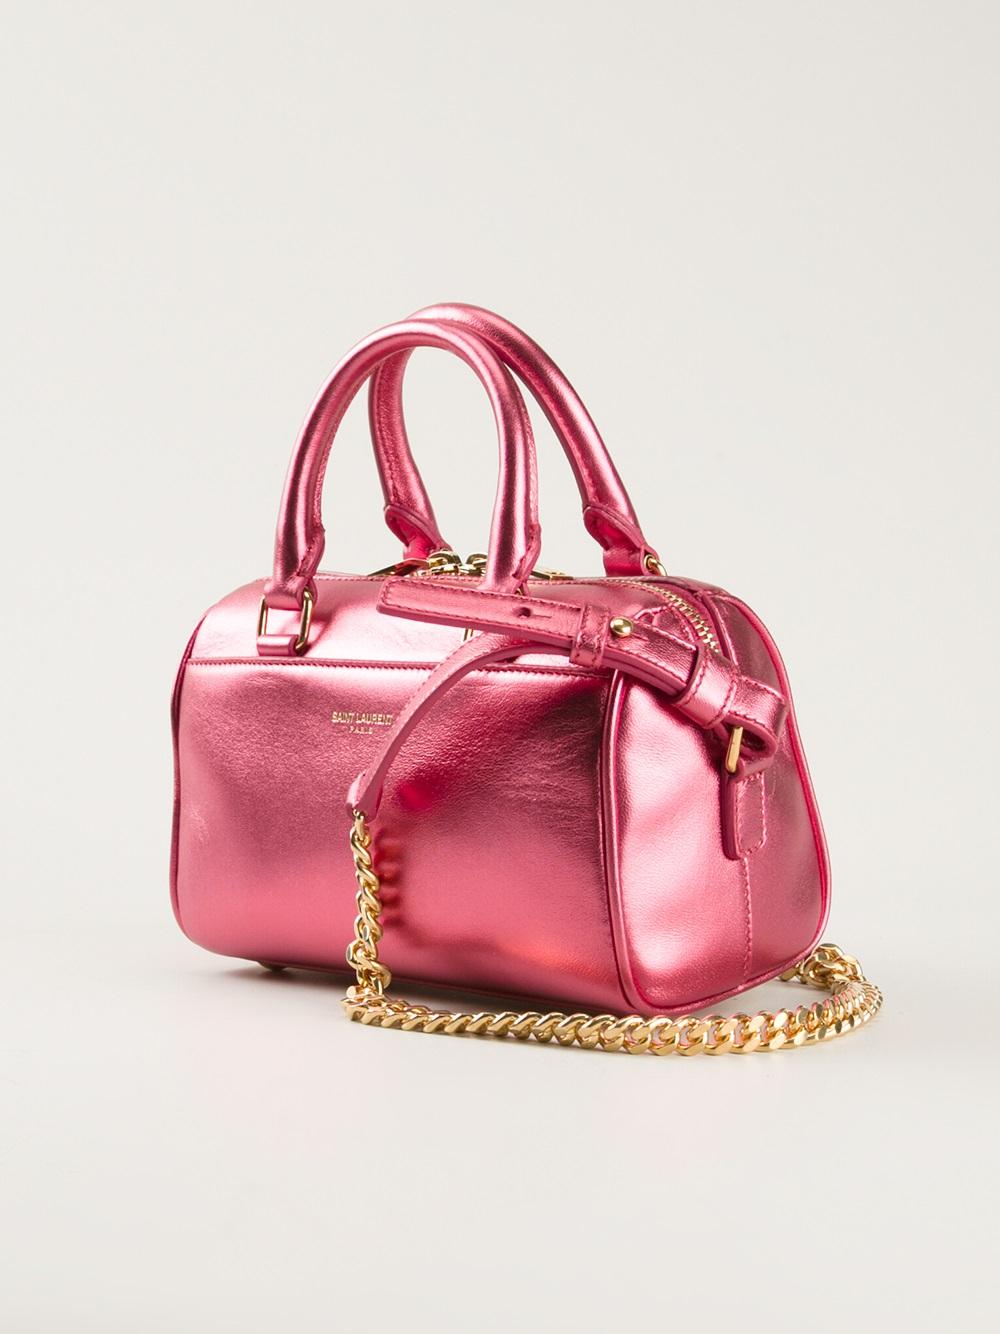 Saint Laurent Baby Duffle Shoulder Bag In Pink Lyst